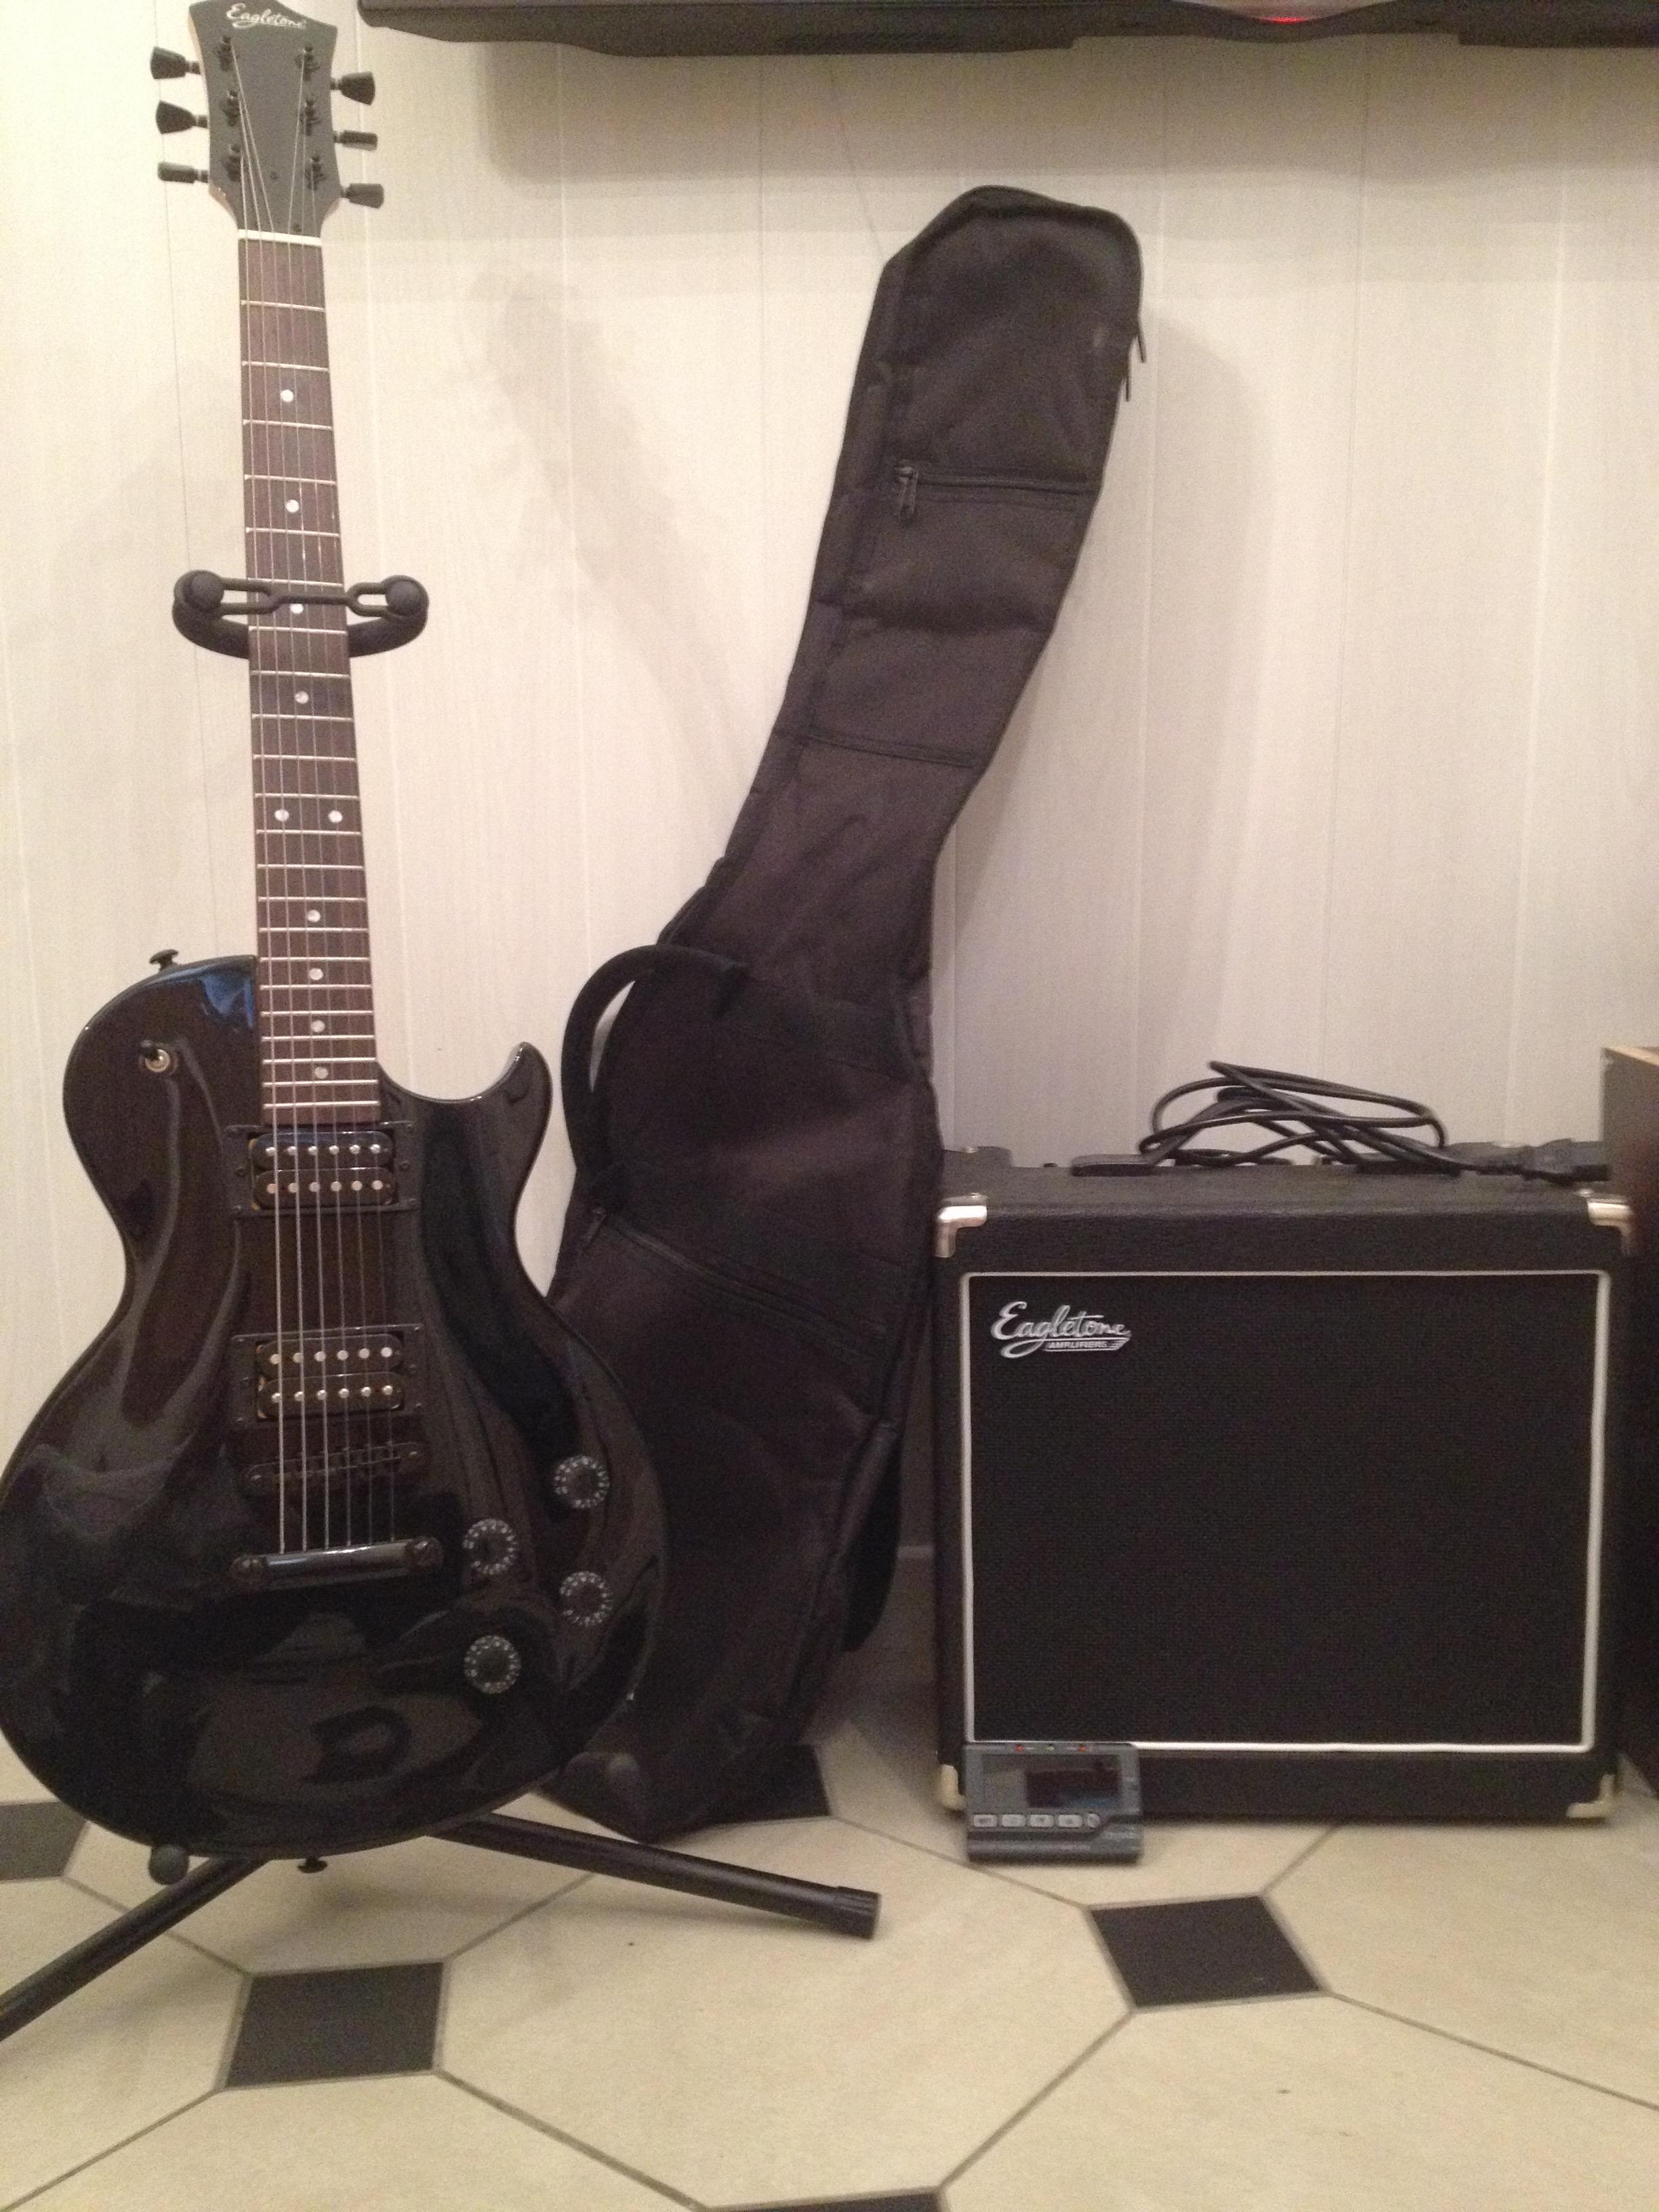 guitare electrique tenson